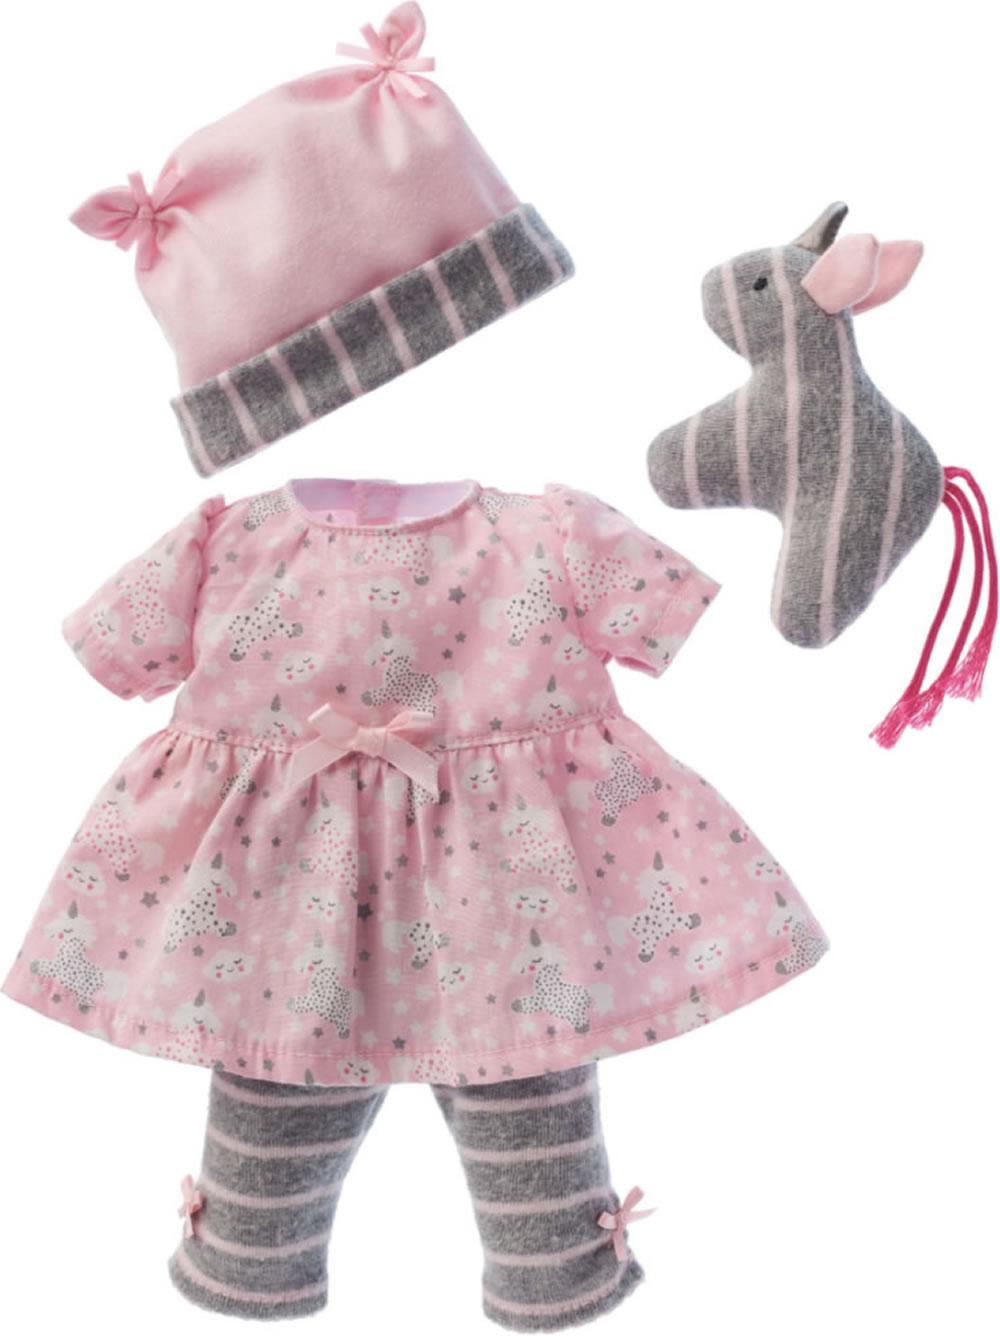 k the kruse kleidung baby puppe 30 33cm kleid mit leggings. Black Bedroom Furniture Sets. Home Design Ideas